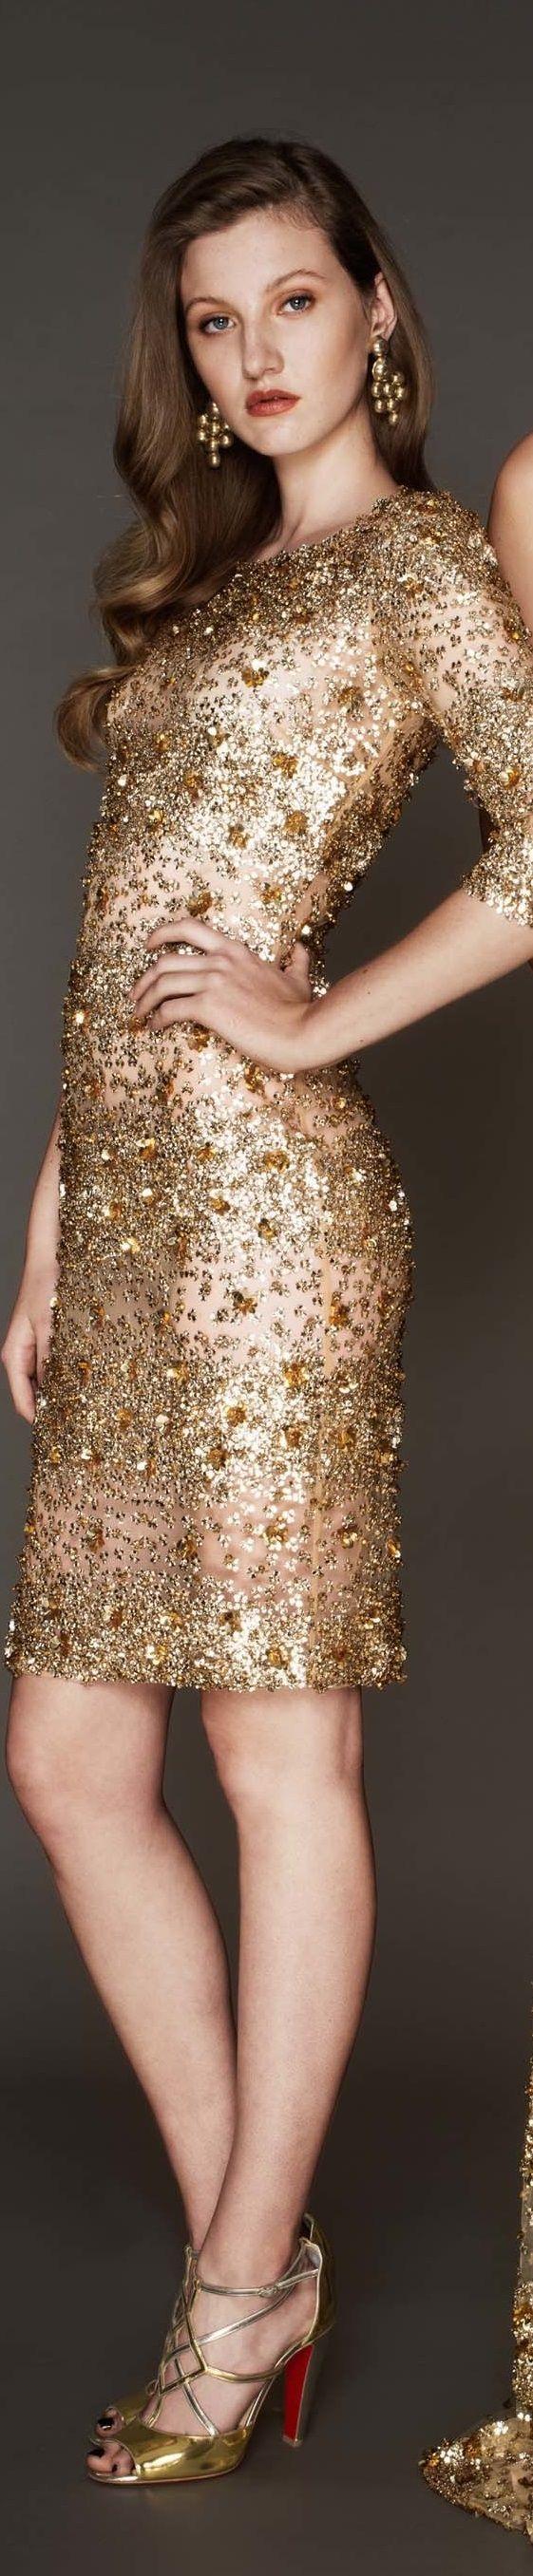 Best 25+ Gold cocktail dress ideas only on Pinterest | Short gold ...